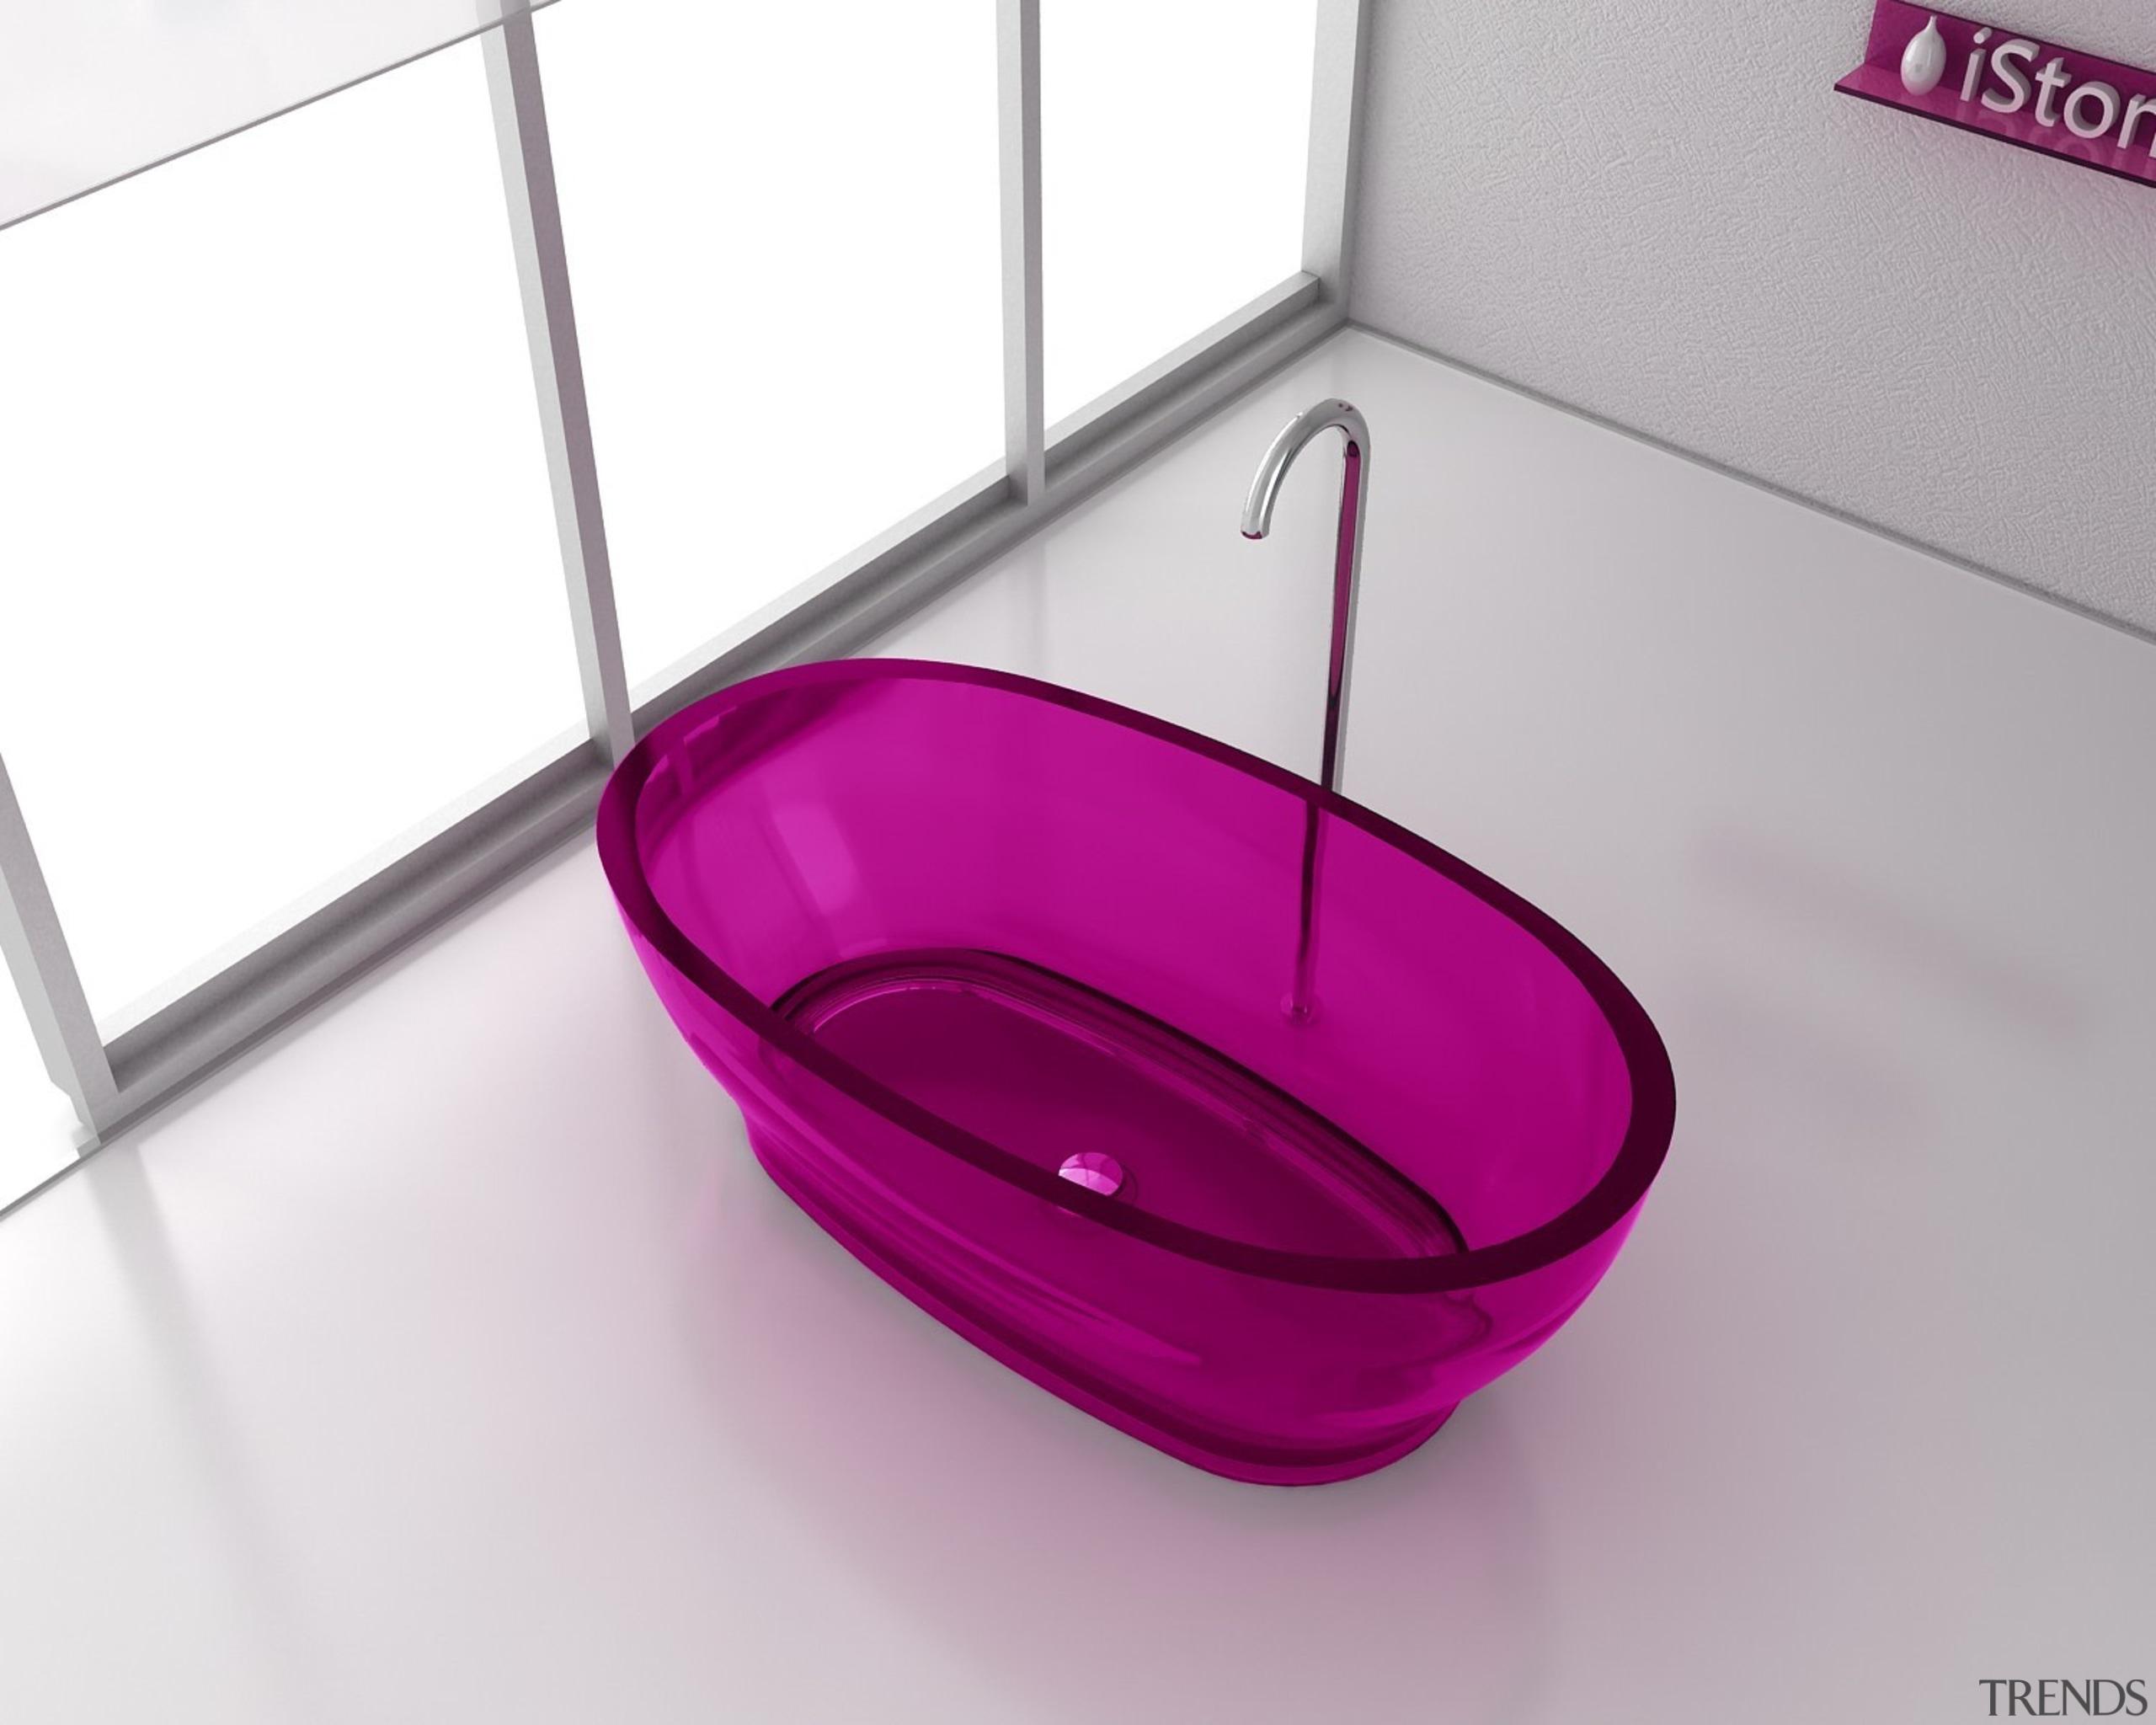 Colour Range Magenta - Colour Range Magenta - magenta, plumbing fixture, product, product design, purple, gray